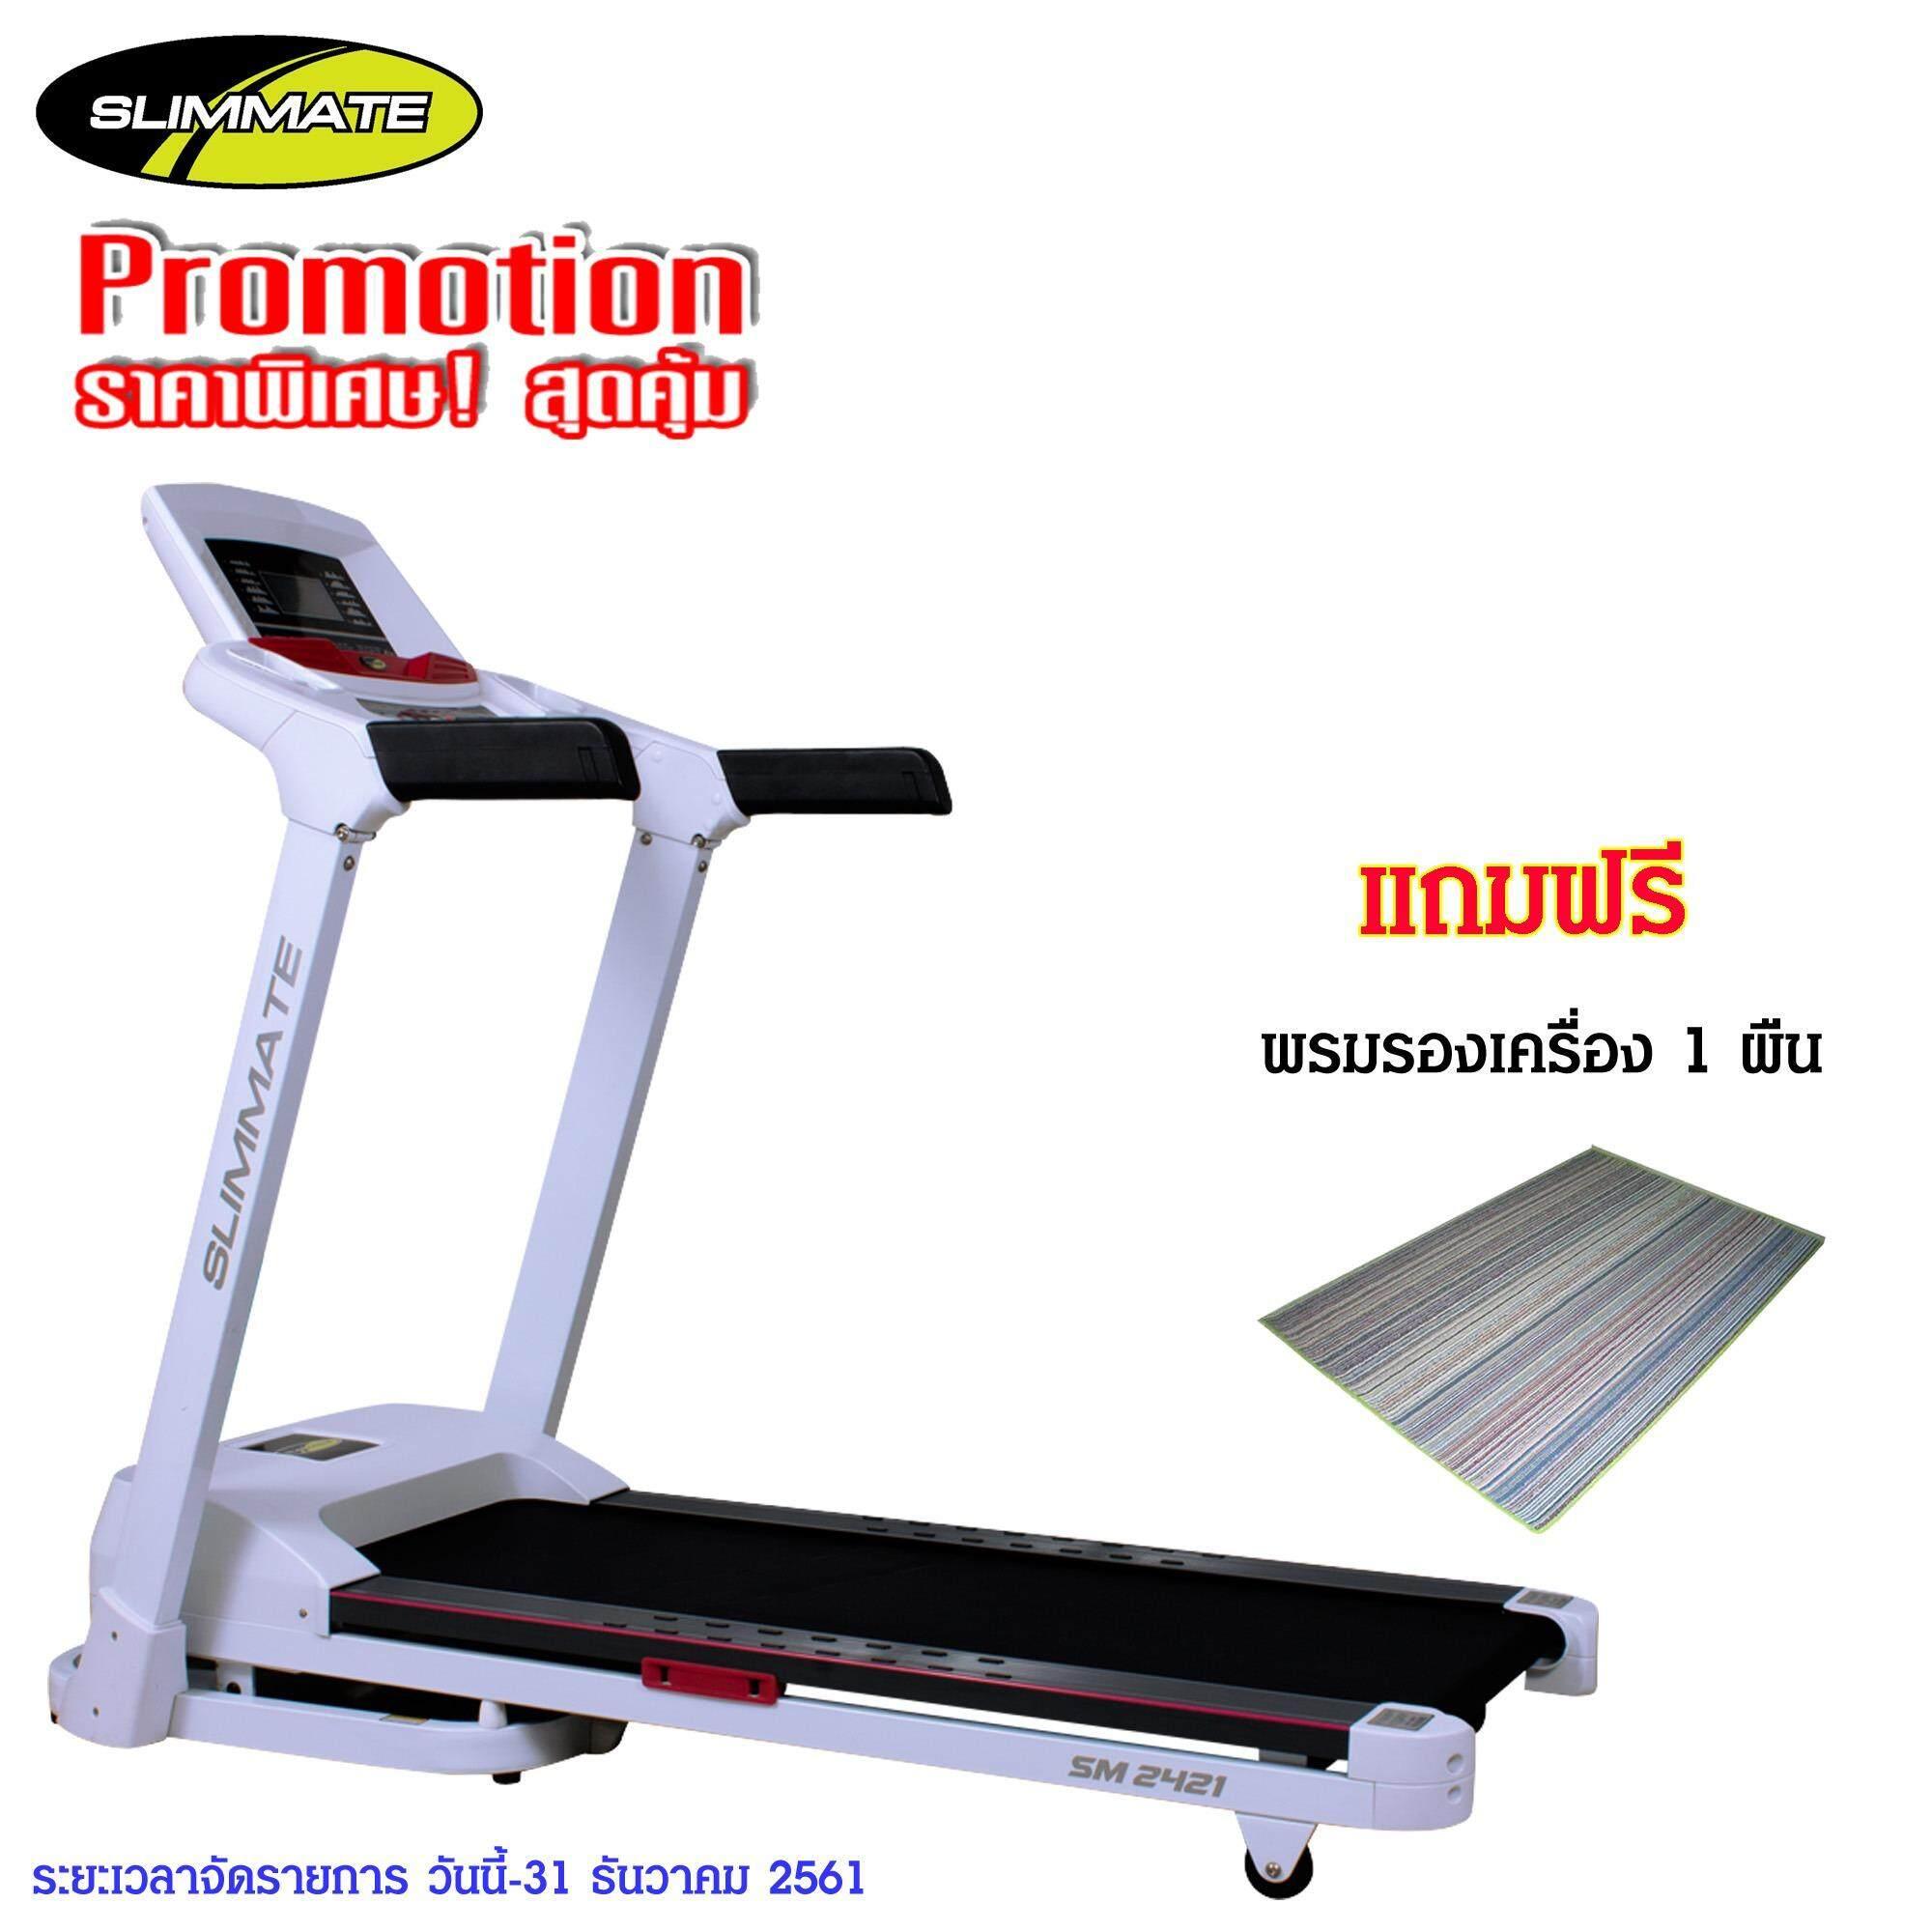 Slimmate เครื่องวิ่งไฟฟ้า TREADMILL รุ่น SM 2421 (White)